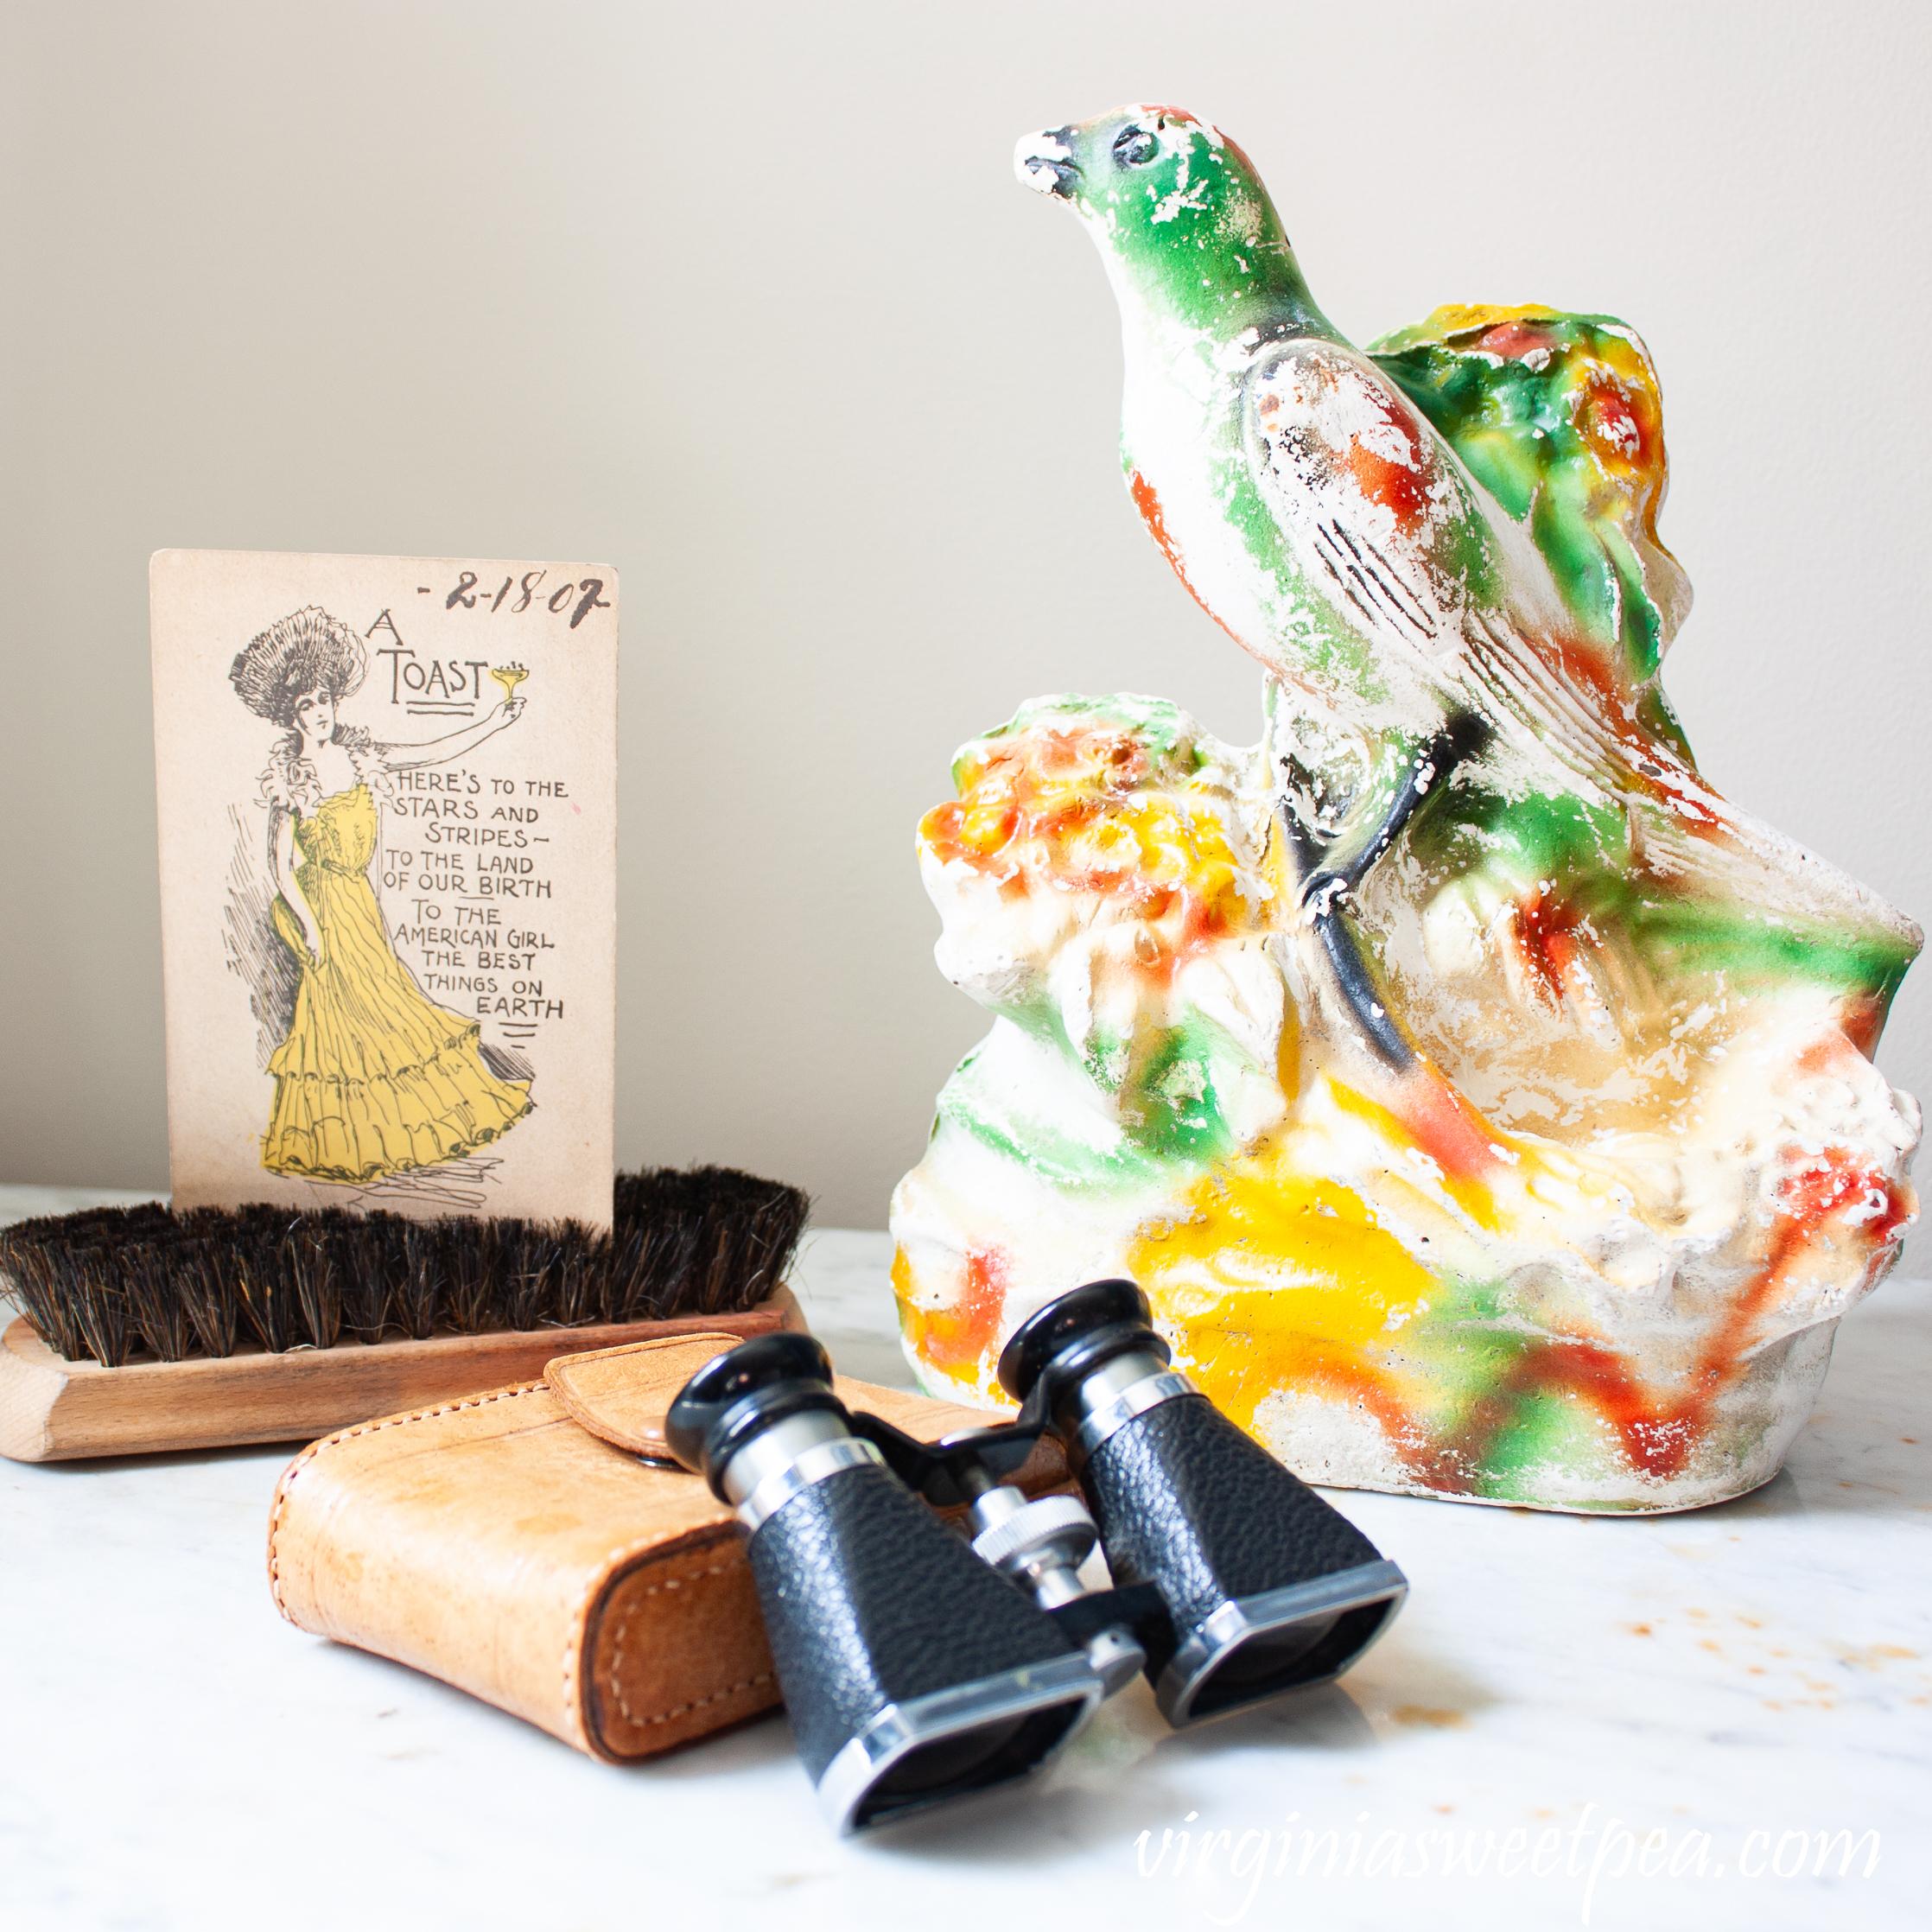 Chalkware bird, vintage binoculars, and a 1907 postcard